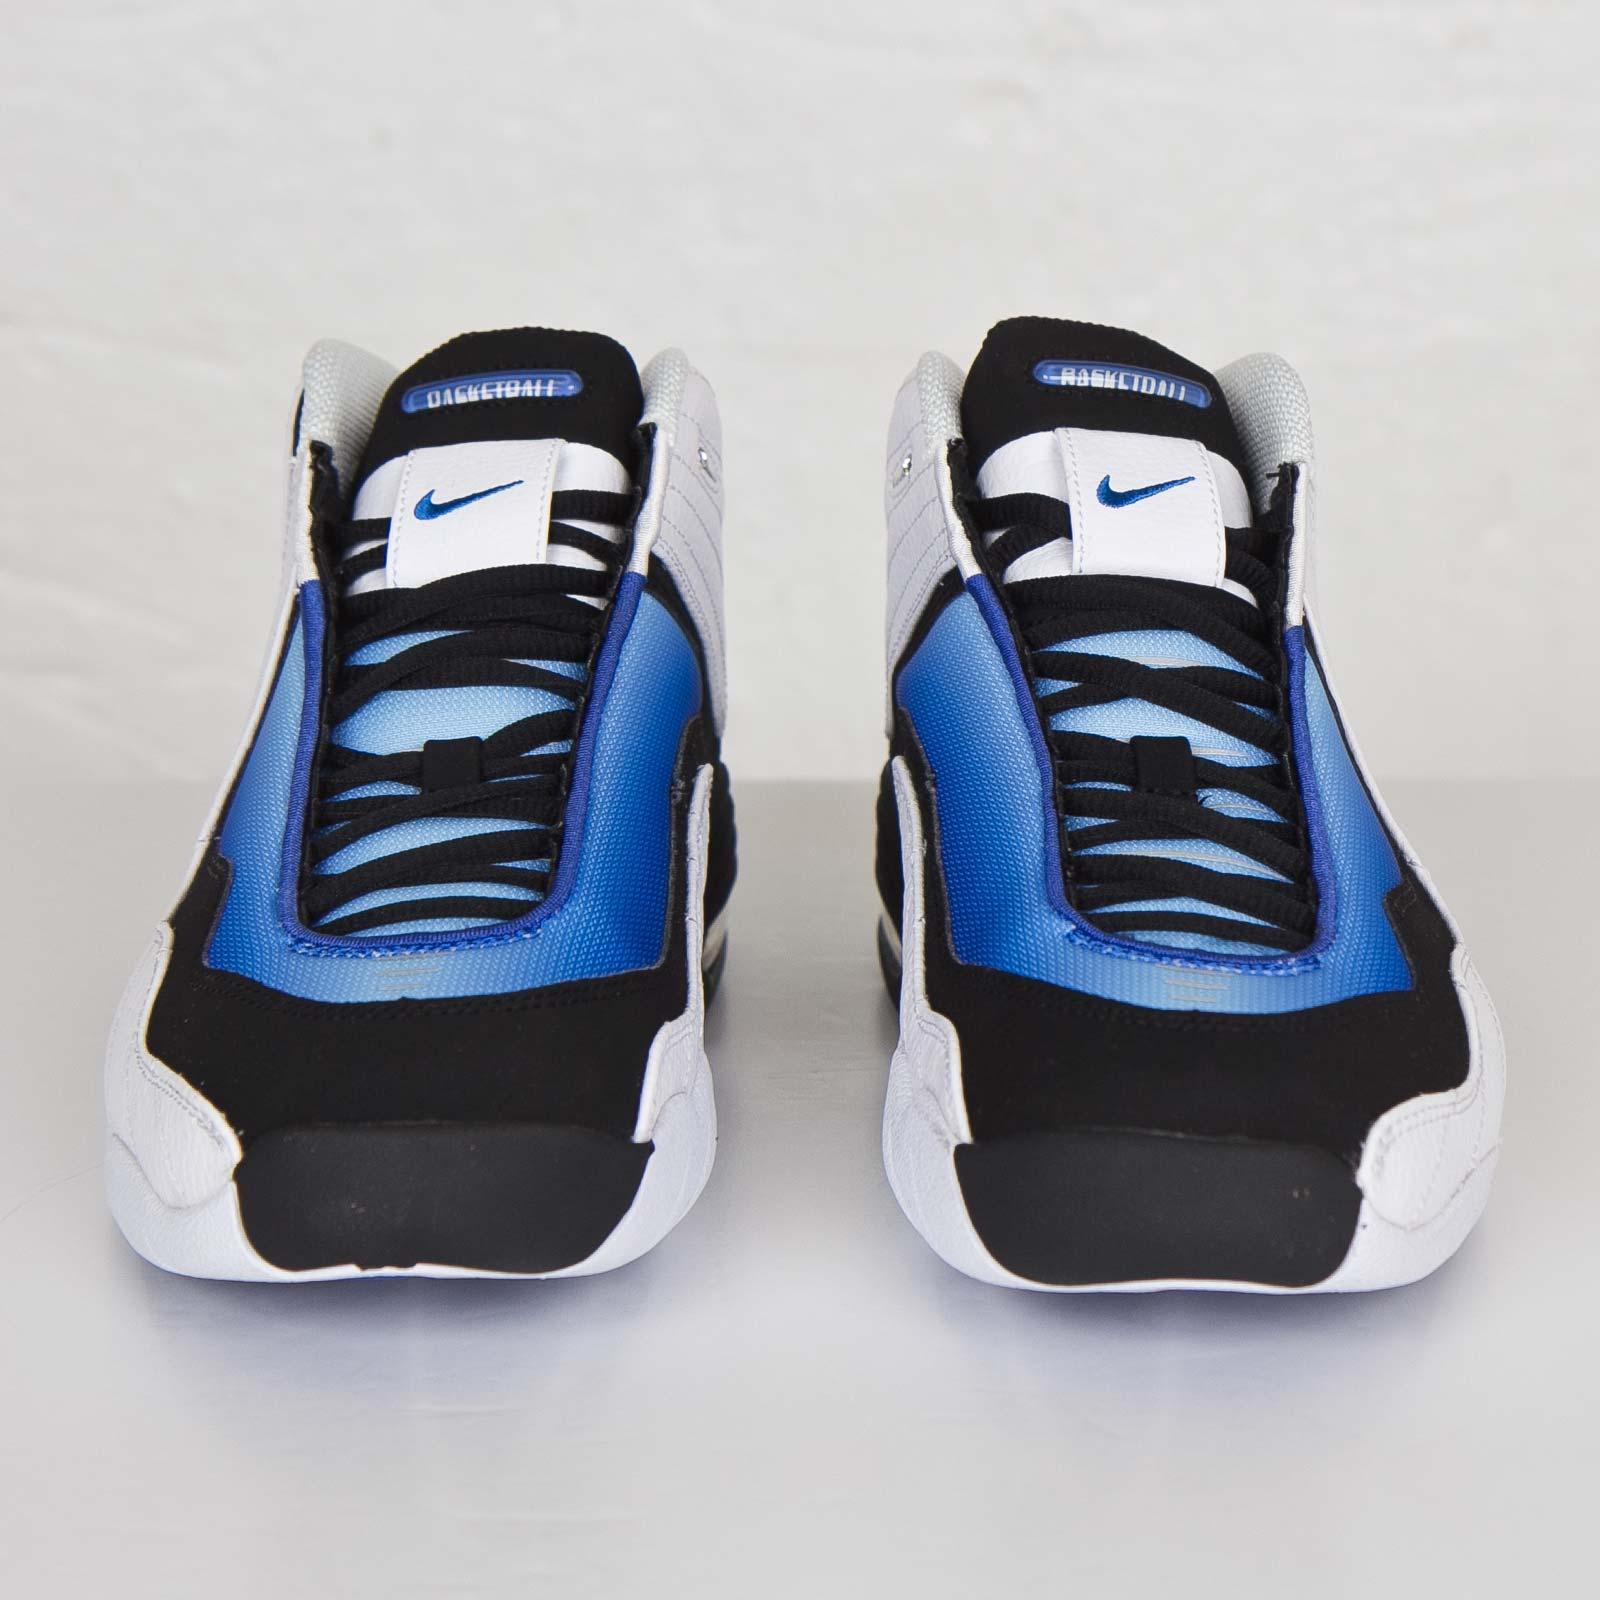 timeless design d443b beca4 Nike Air 3 - 749634-100 - Sneakersnstuff   sneakers   streetwear online  since 1999